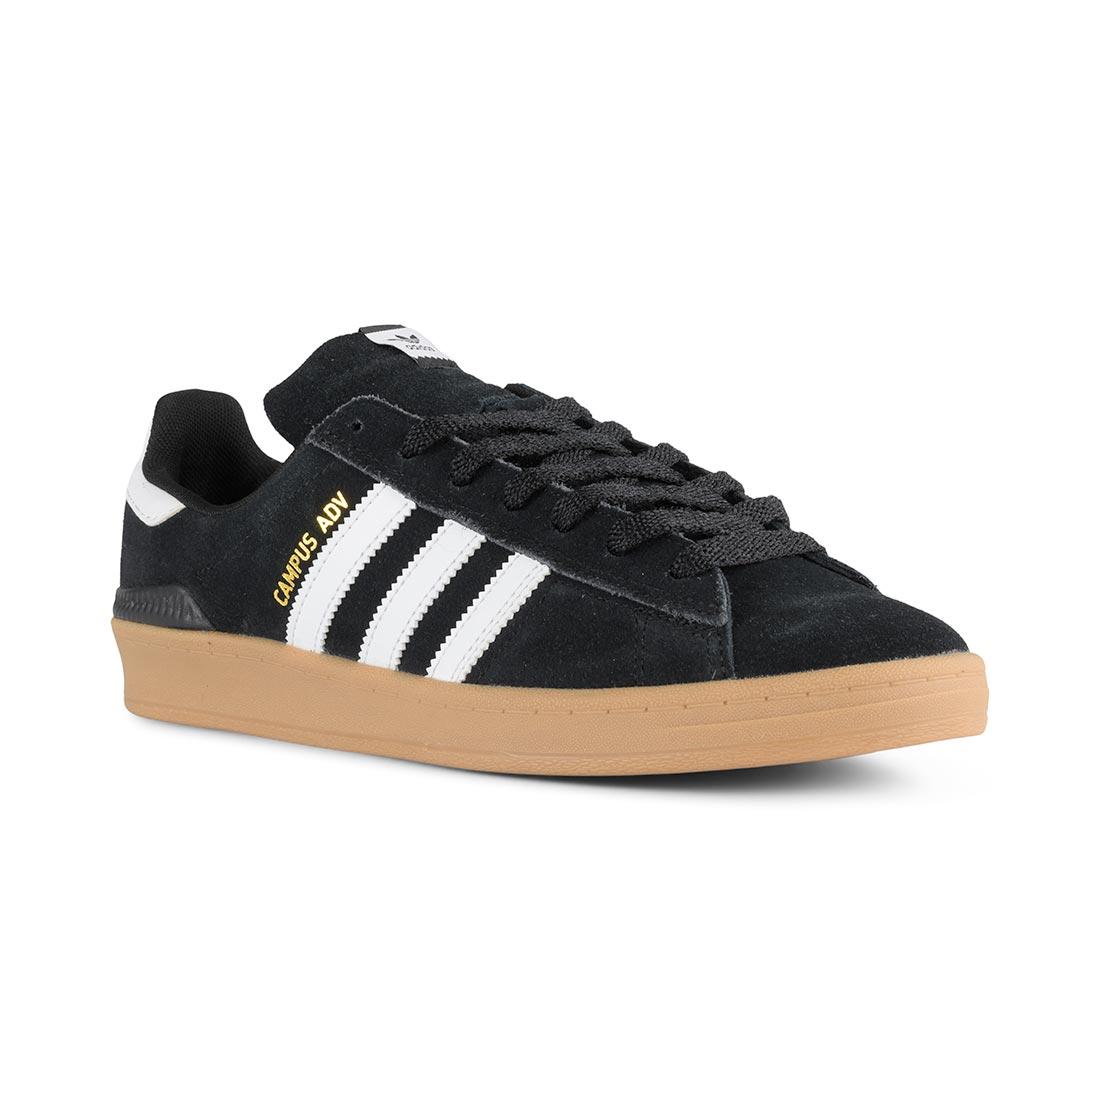 Adidas Campus ADV Shoes Core Black Cloud White Gum